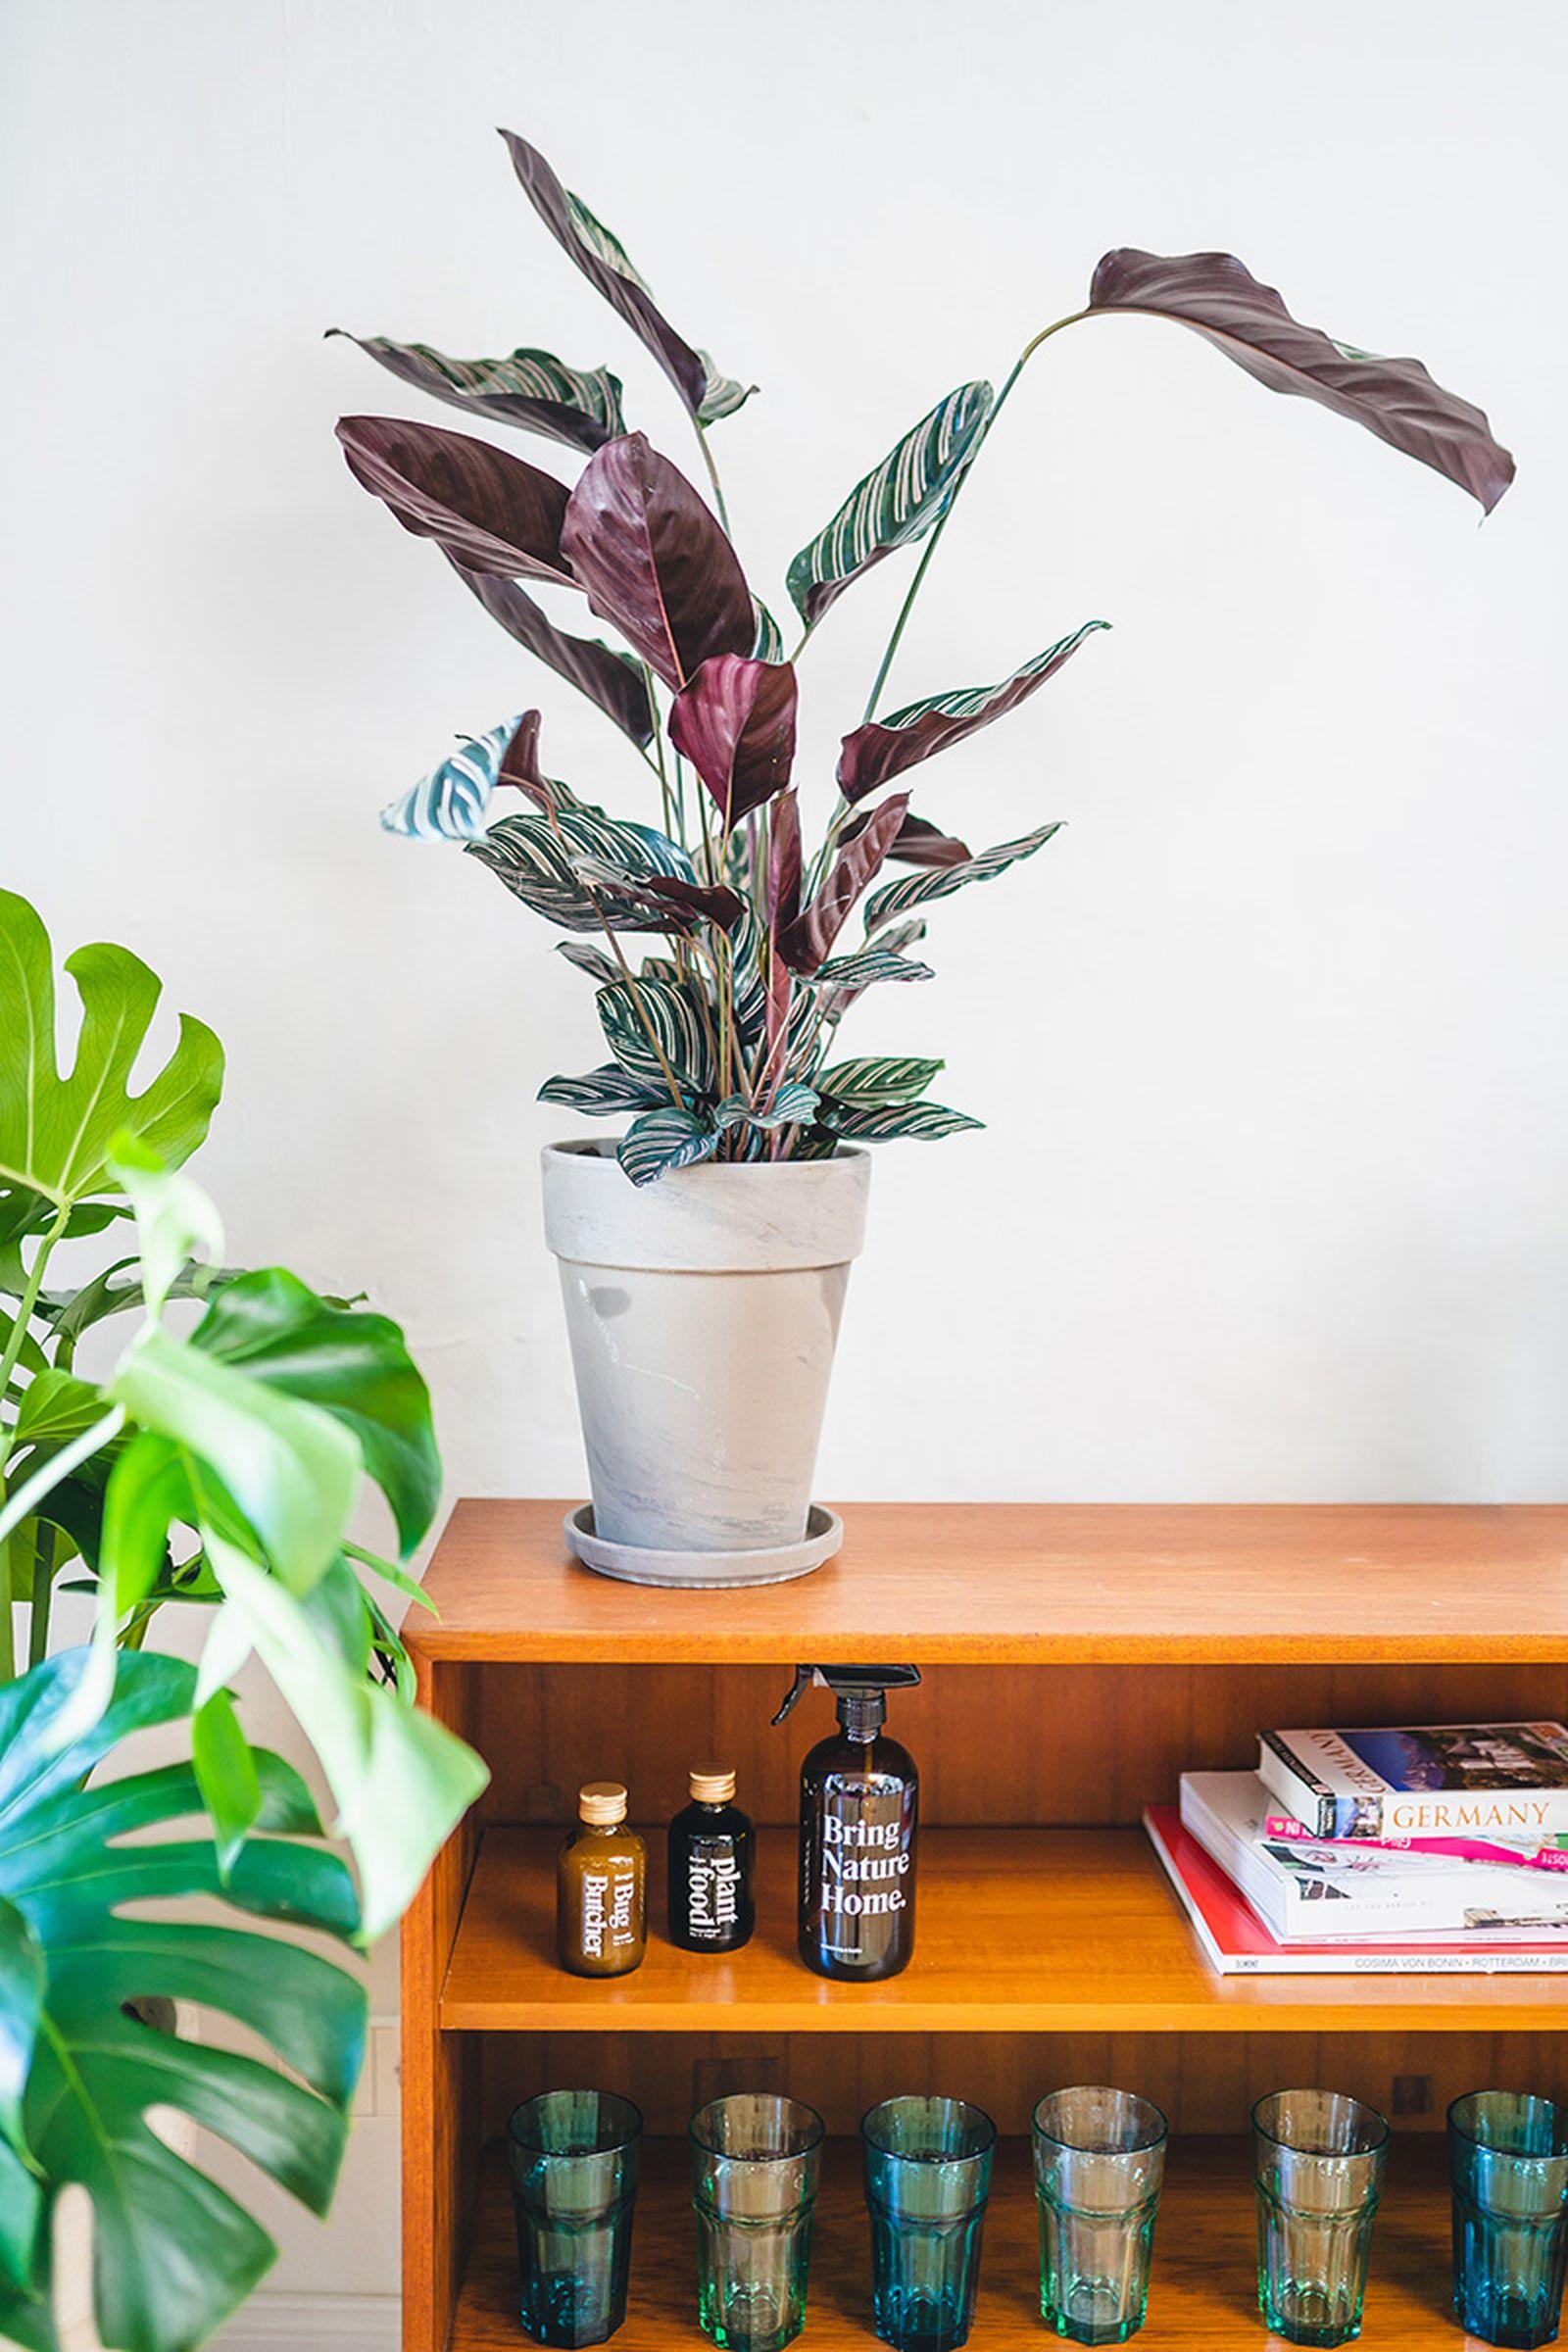 easy-house-plants-for-beginners-08